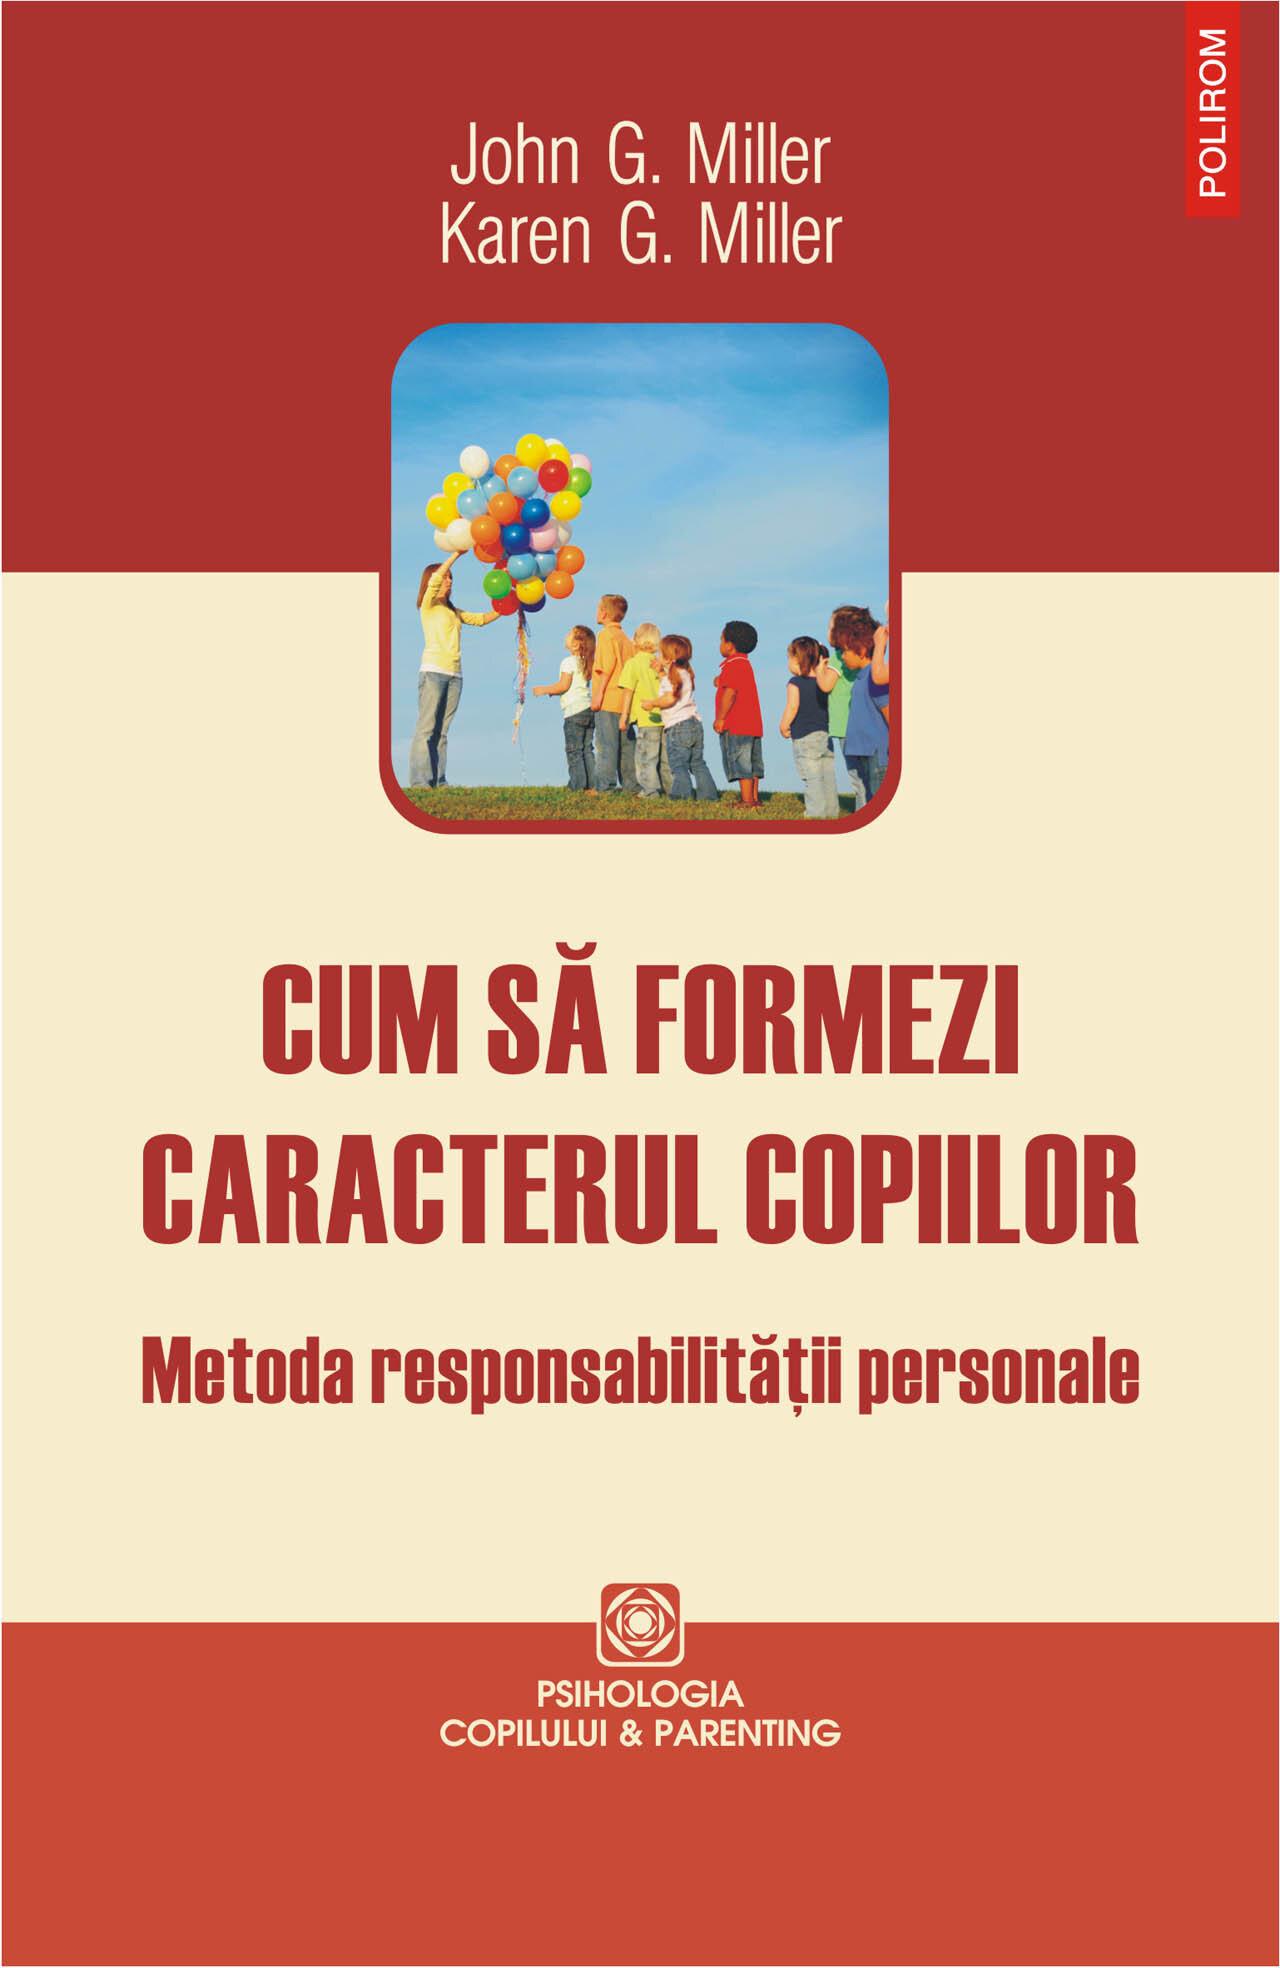 Cum sa formezi caracterul copiilor. Metoda responabilitatii personale (eBook)